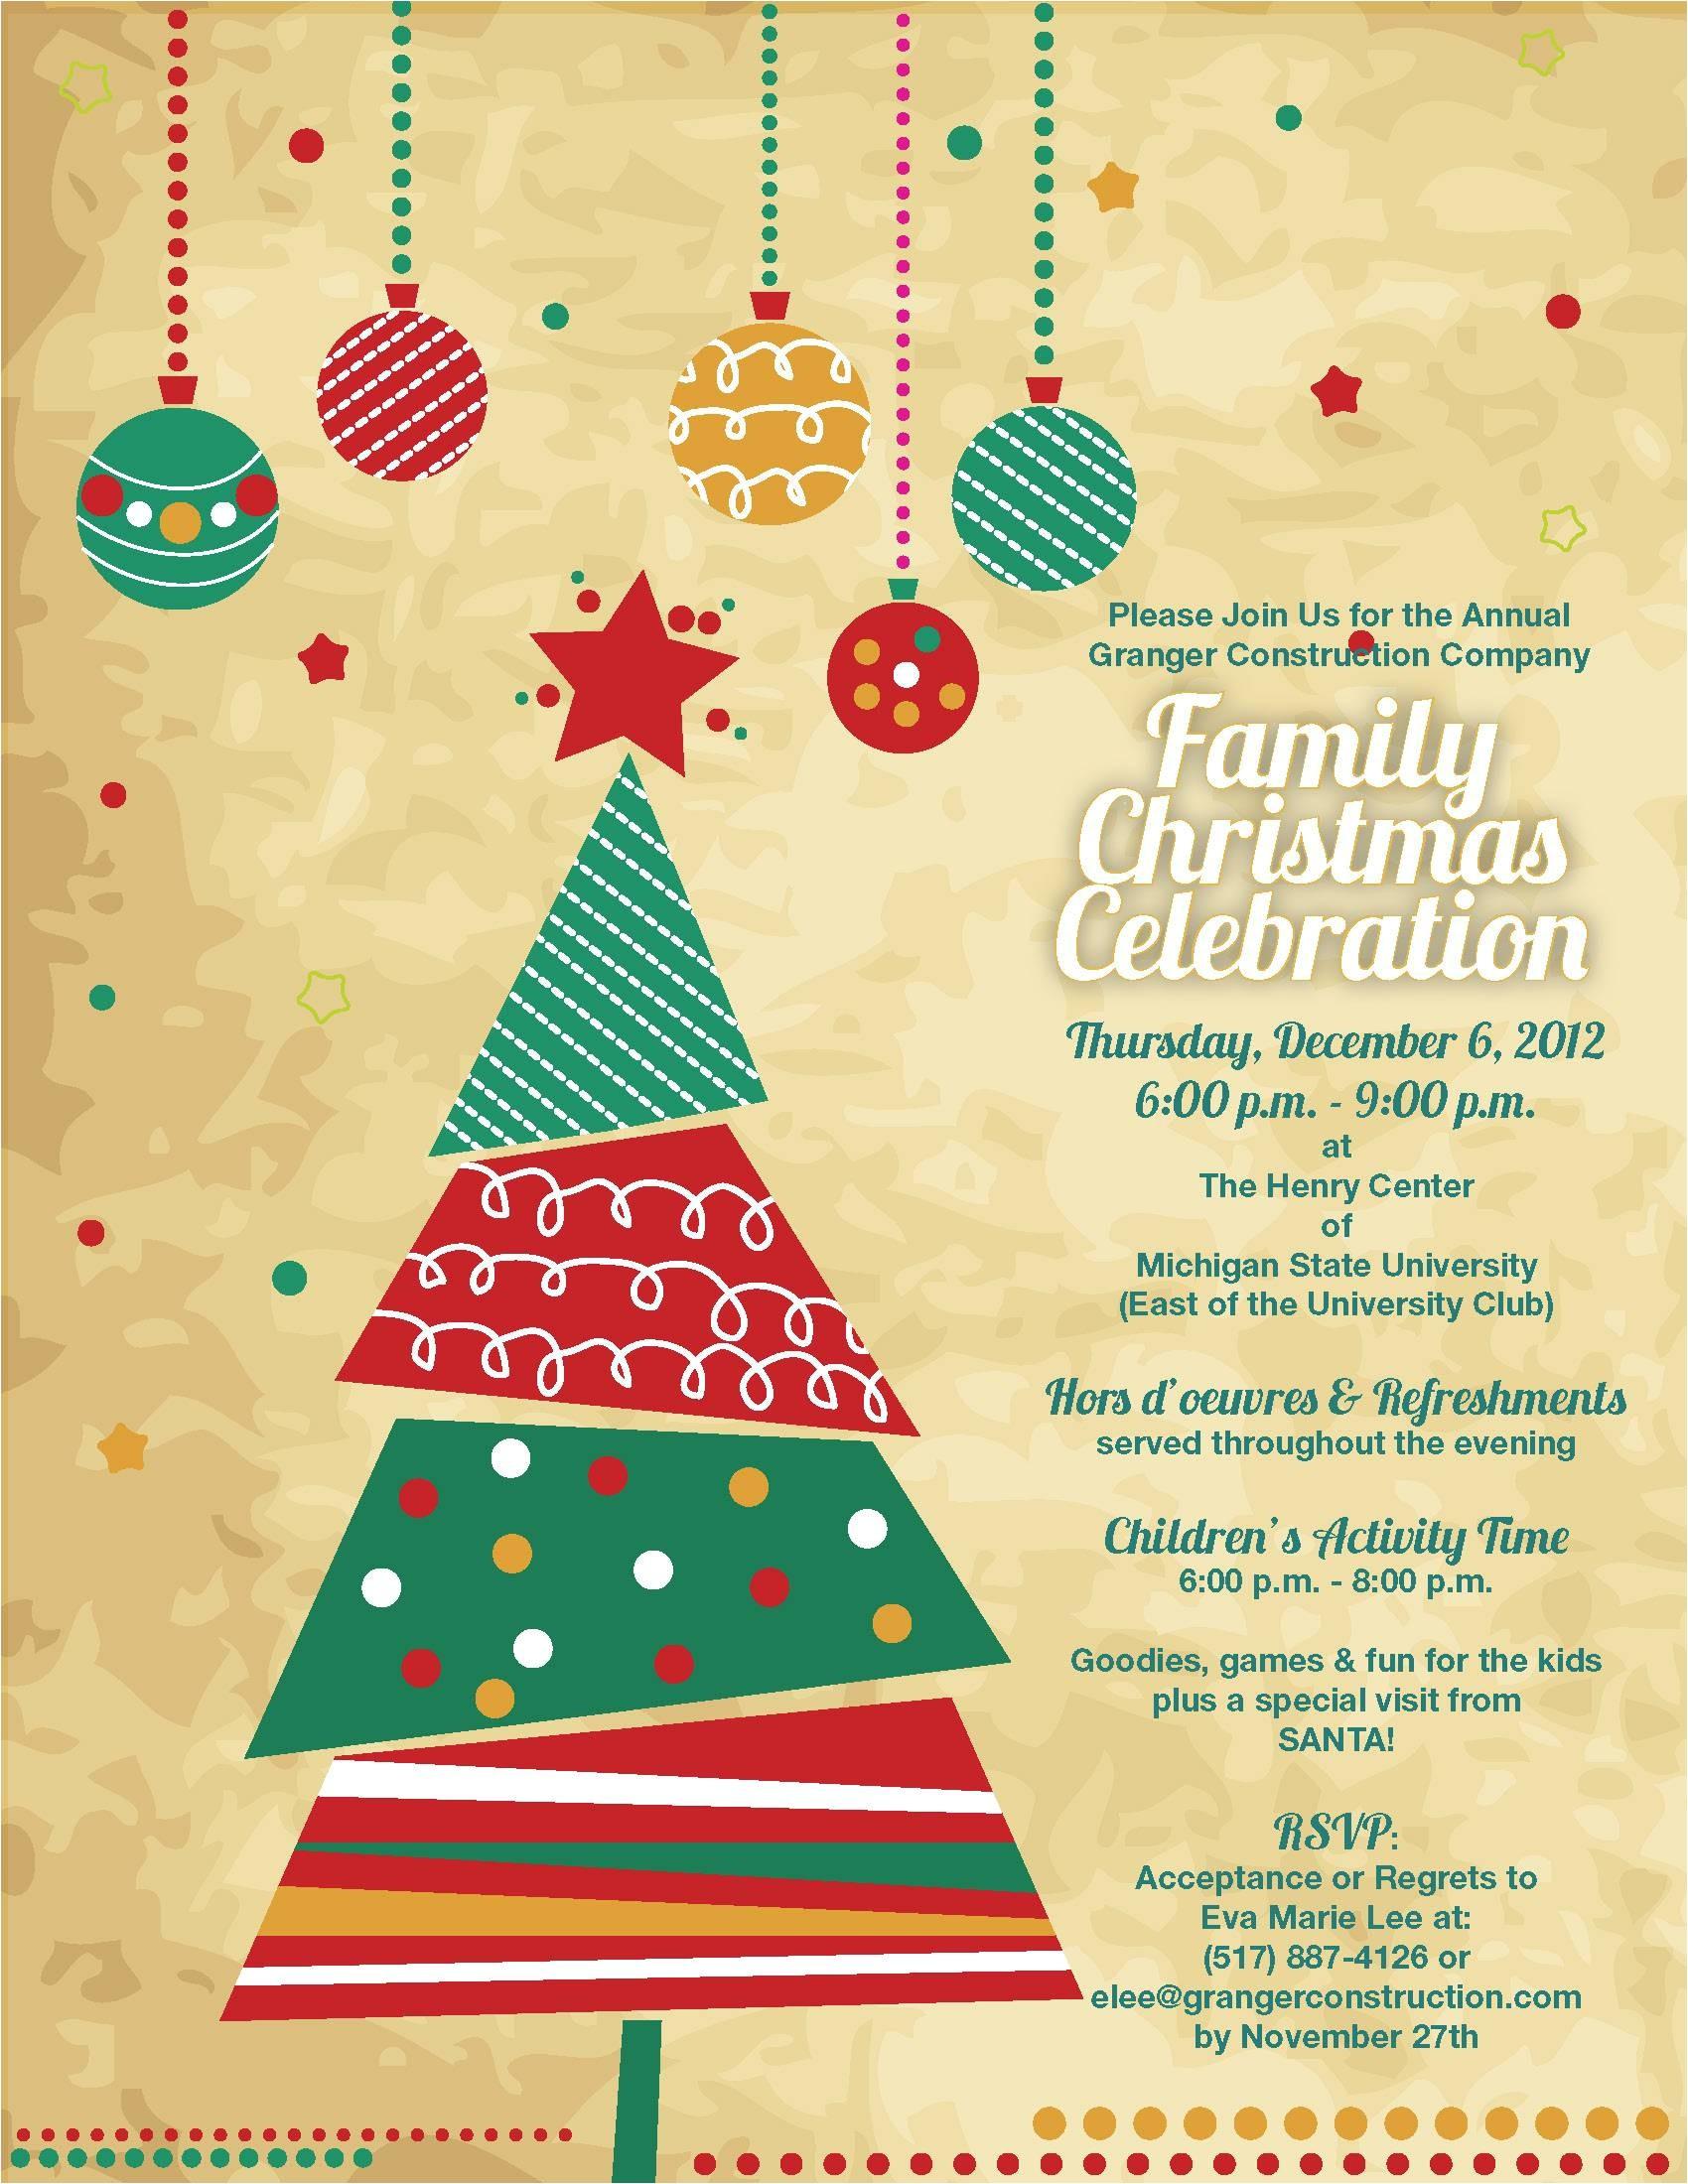 Office Holiday Party Invitation Ideas Christmas Party Invitation Template Party Invitations